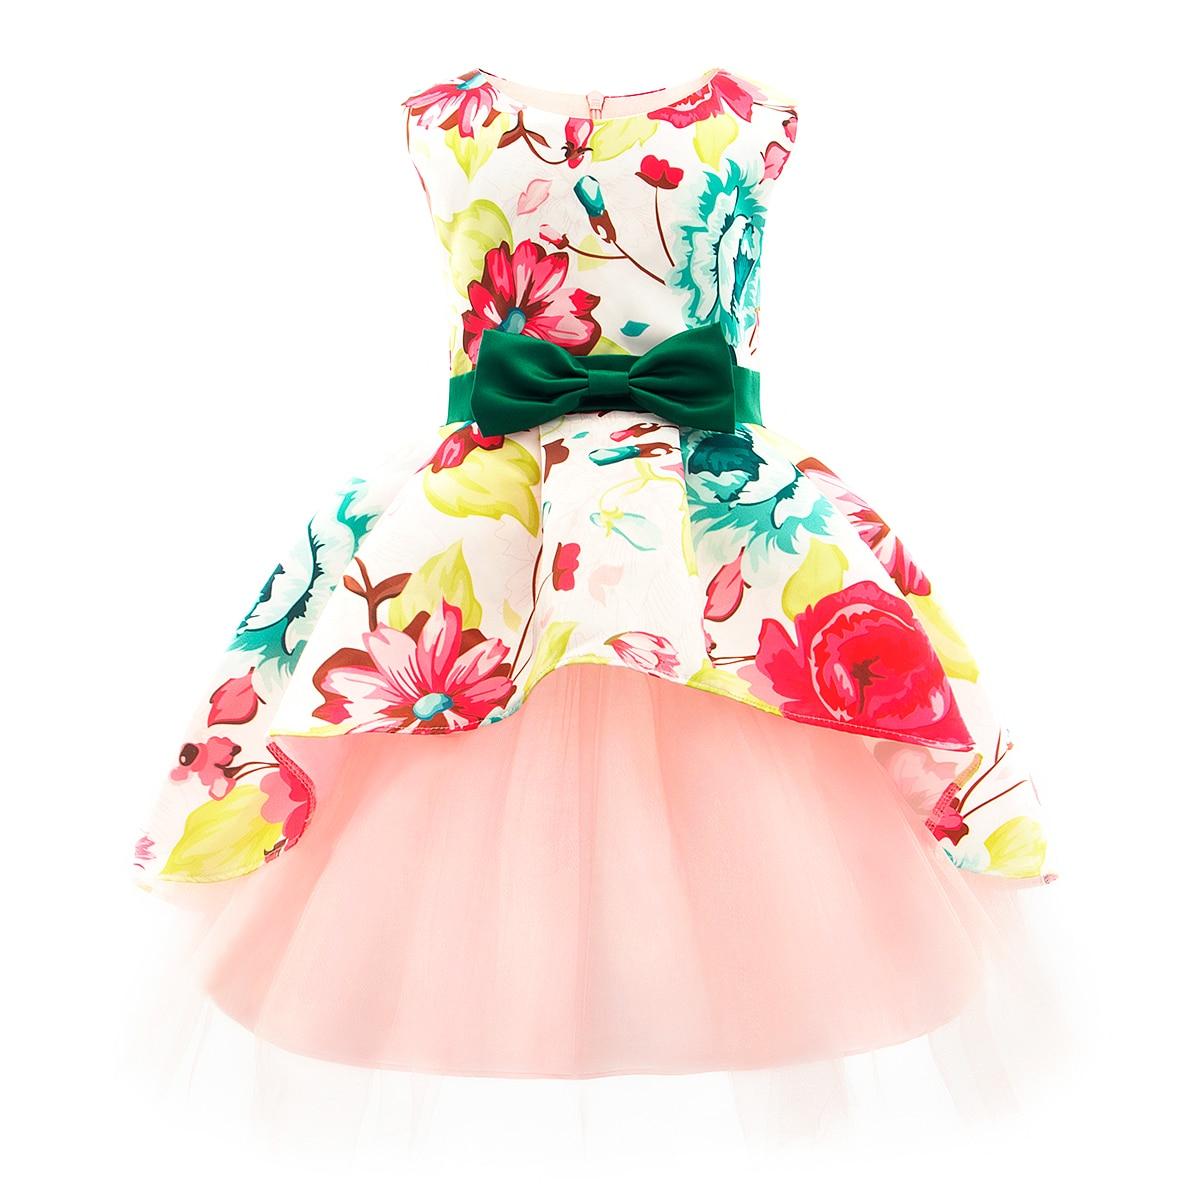 2020 Spring Summer Princess Girl Dress Flower Print Dresses Wedding Birthday Party Vestidos Tutu Dress Baby Child Flower Apparel